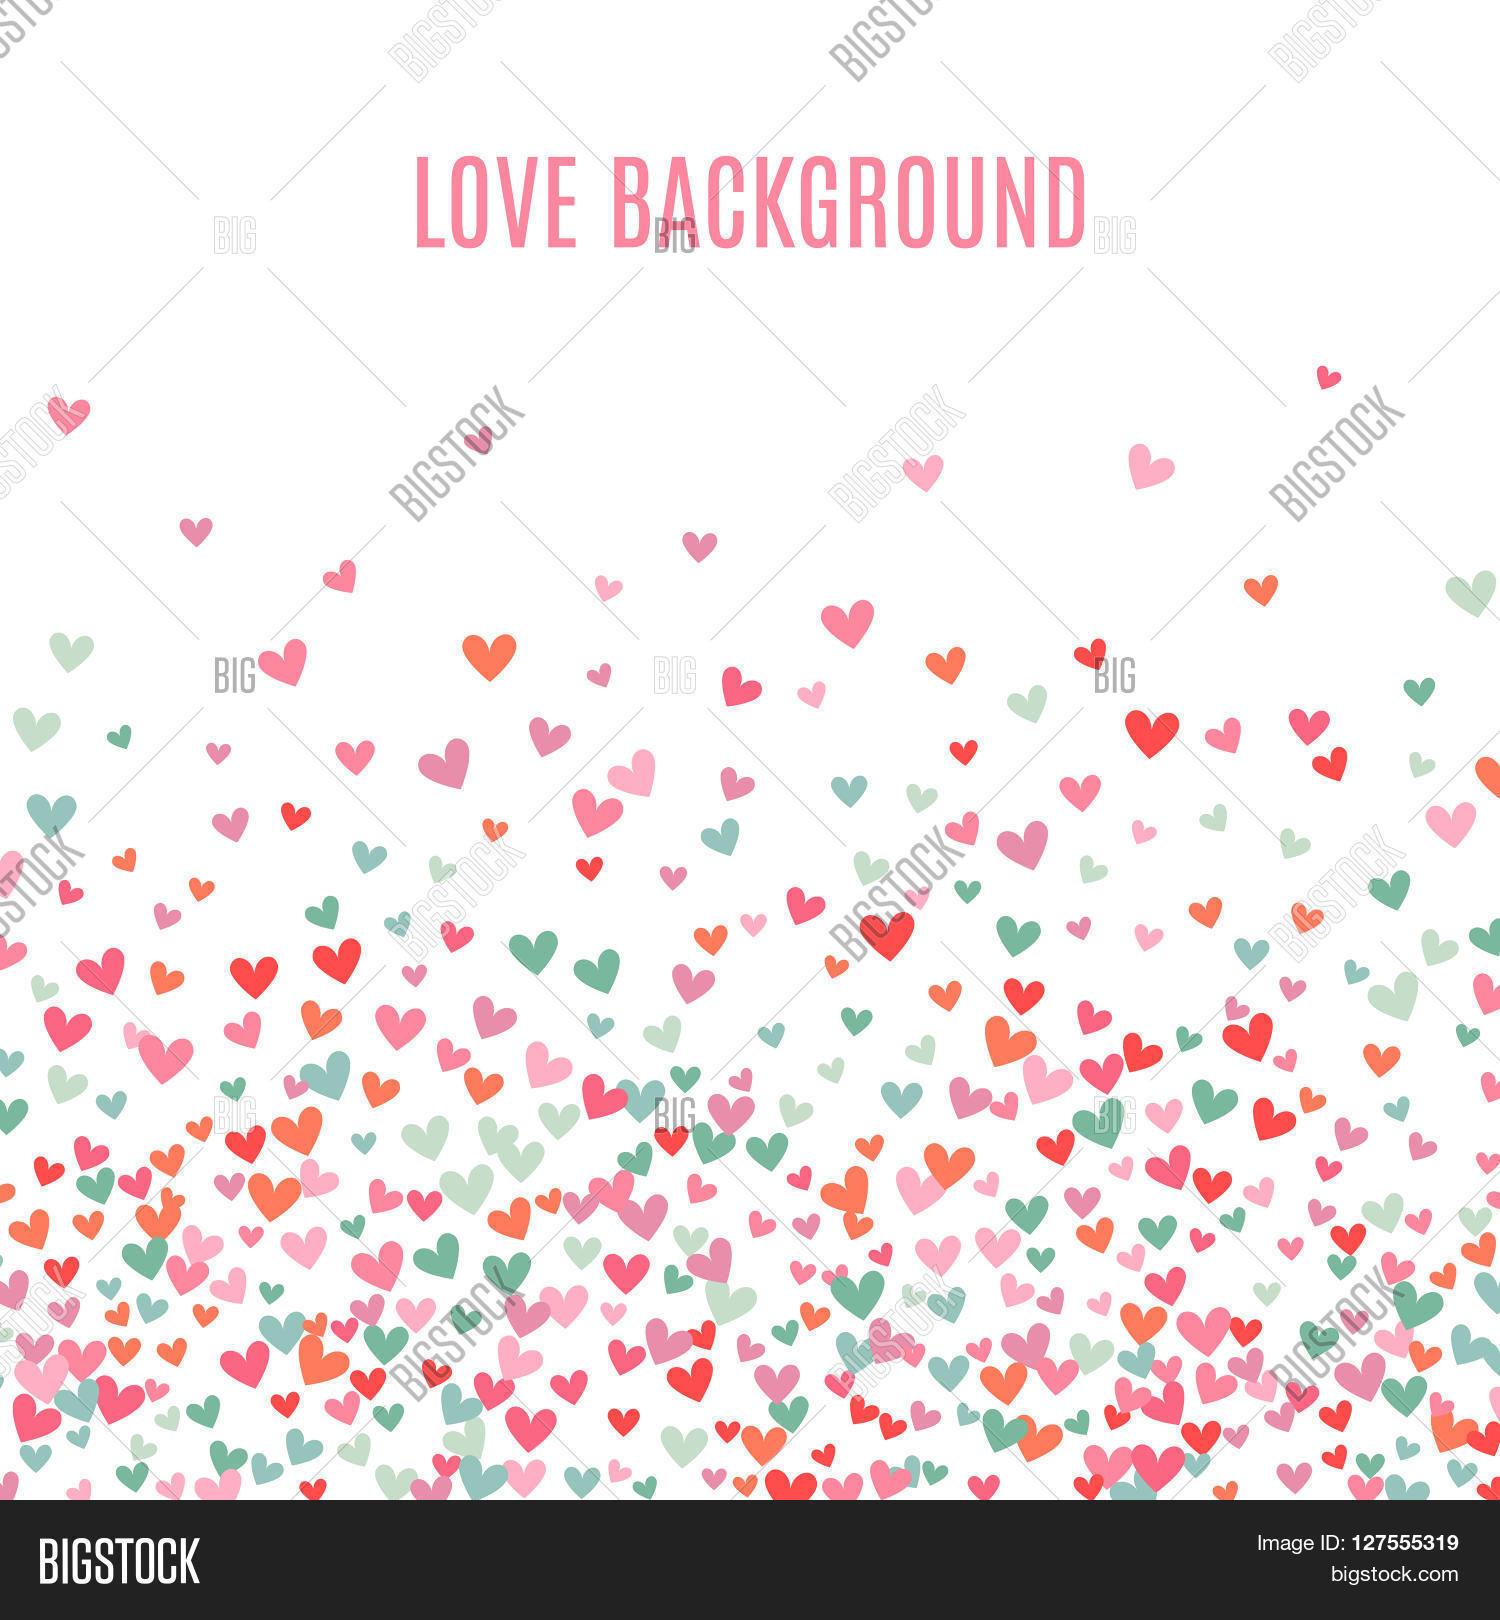 Romantic Pink Blue Image Photo Free Trial Bigstock